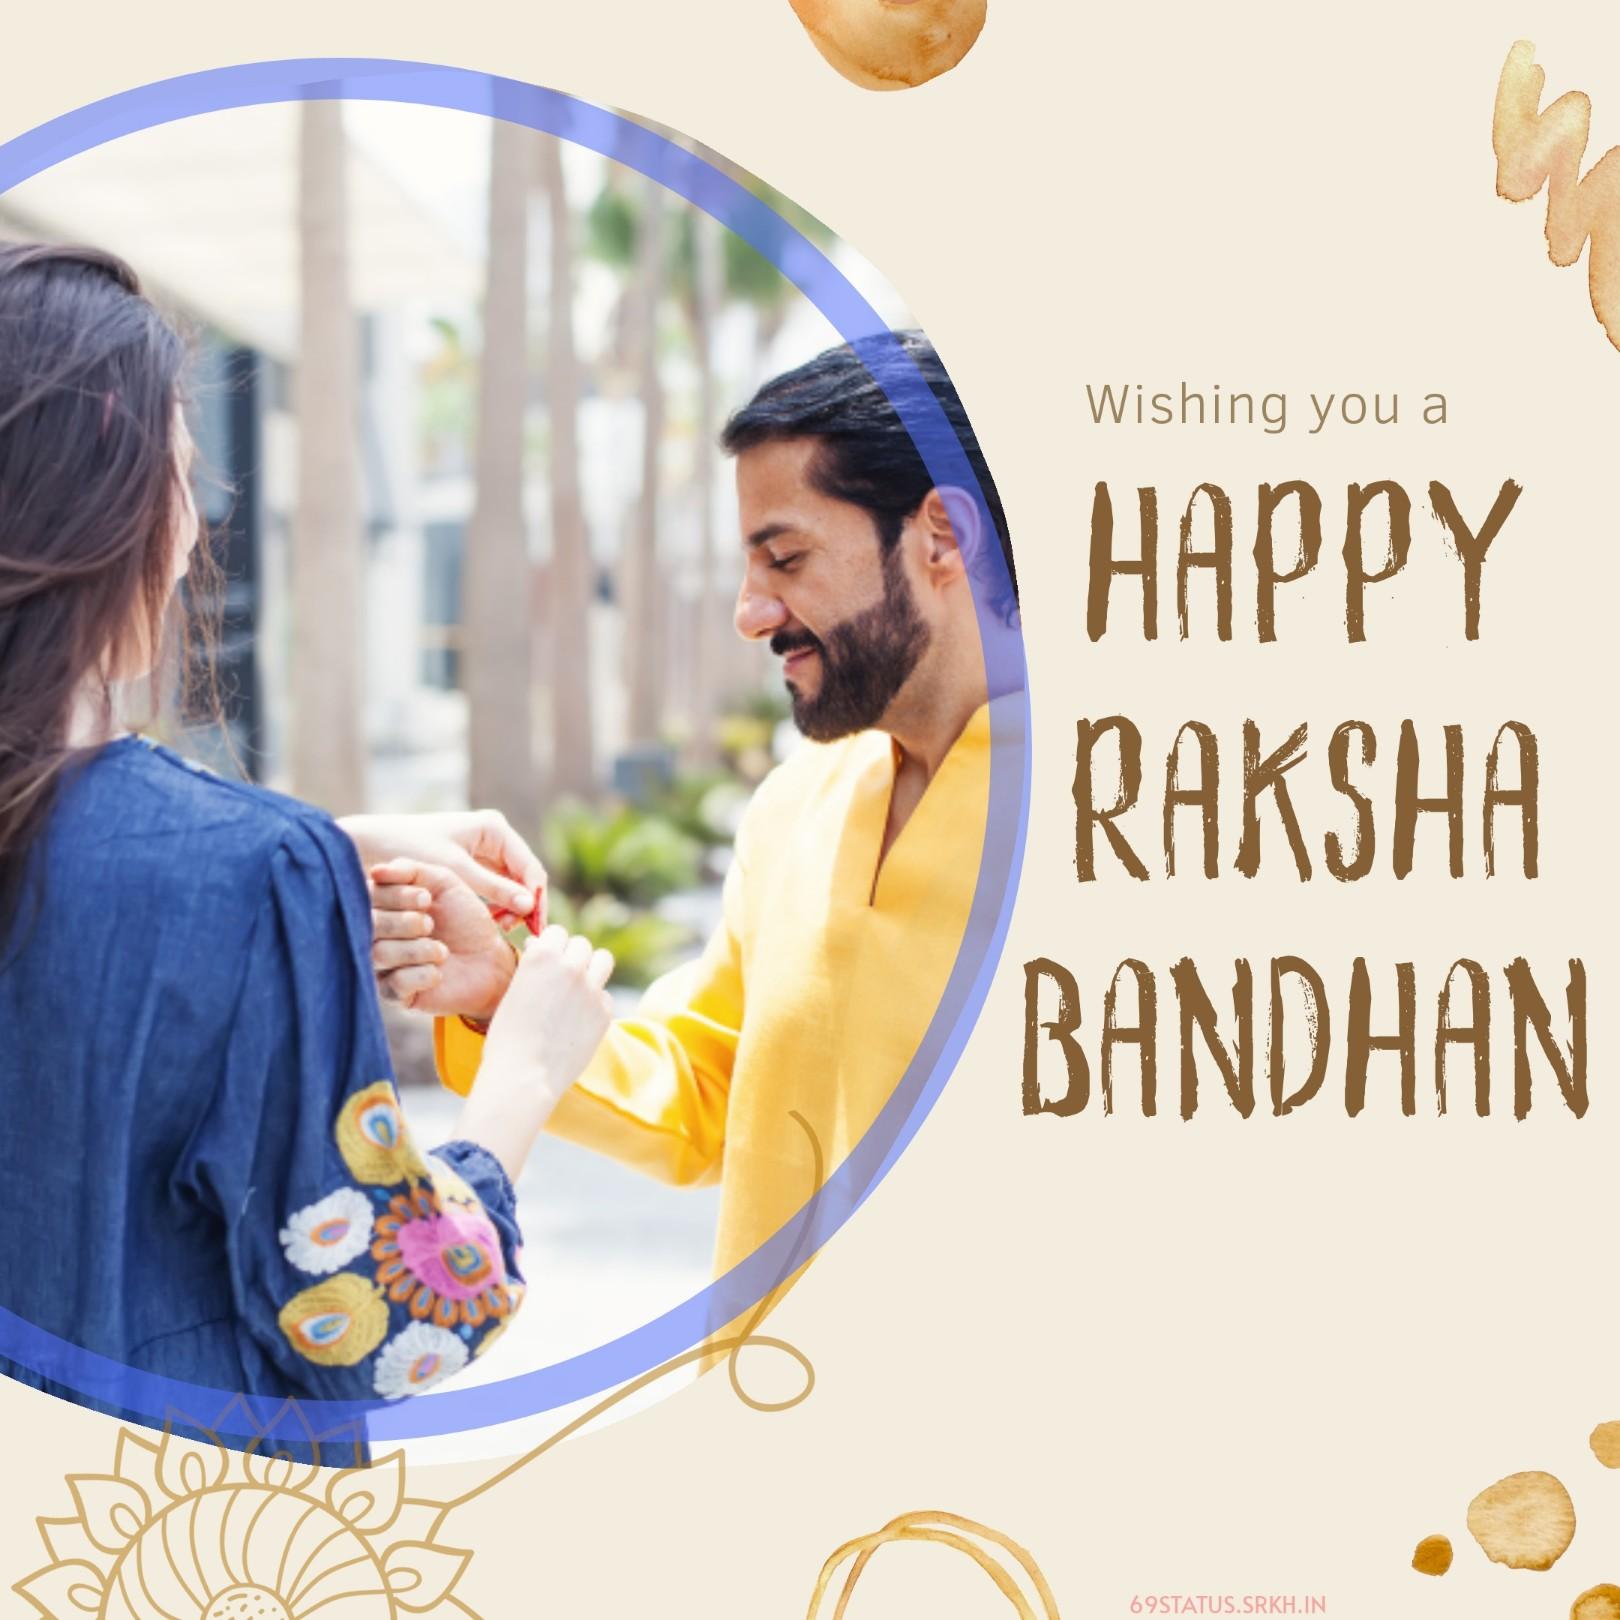 Raksha Bandhan Special Images full HD free download.